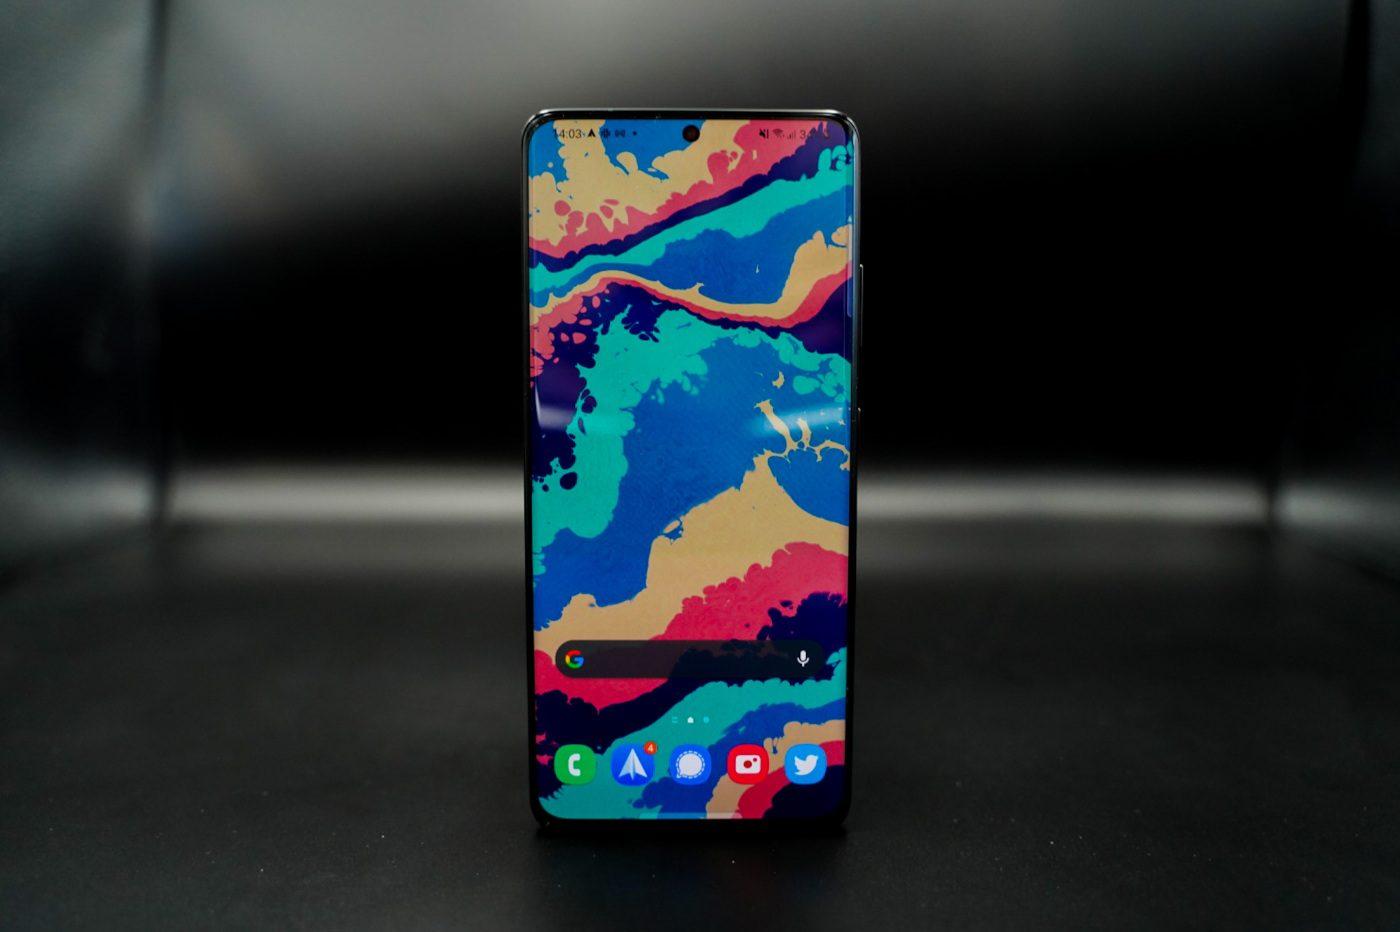 test galaxy s21 ultra screen